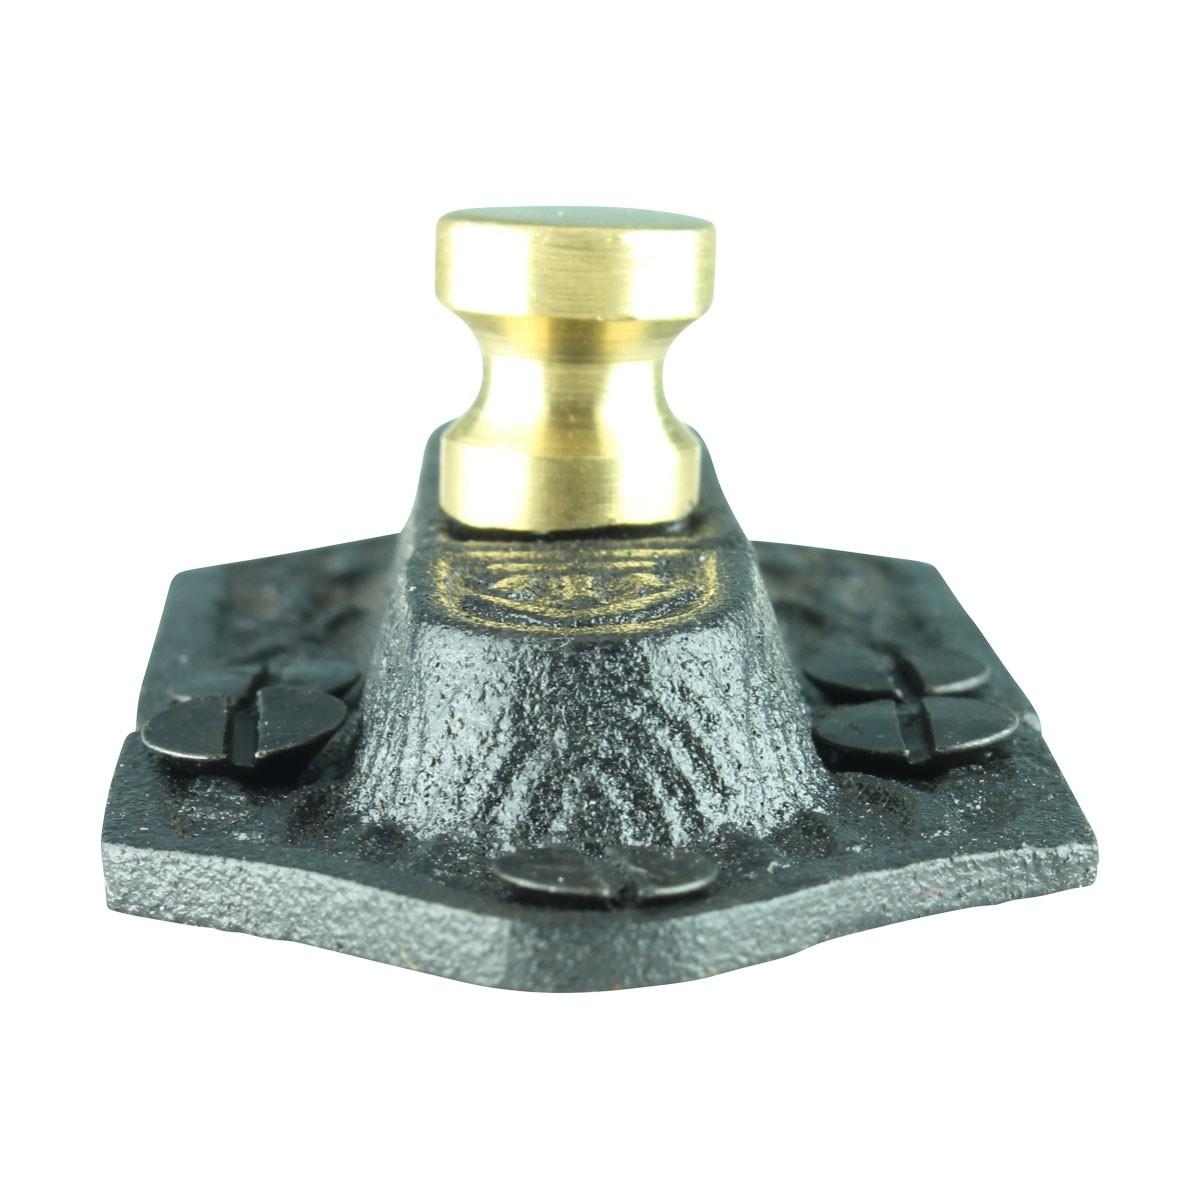 Ornate Cast Iron Slide Cabinet Latch Brass Knob Cabinet Latch Brass Cabinet Latch Antique Black Cabinet Latch